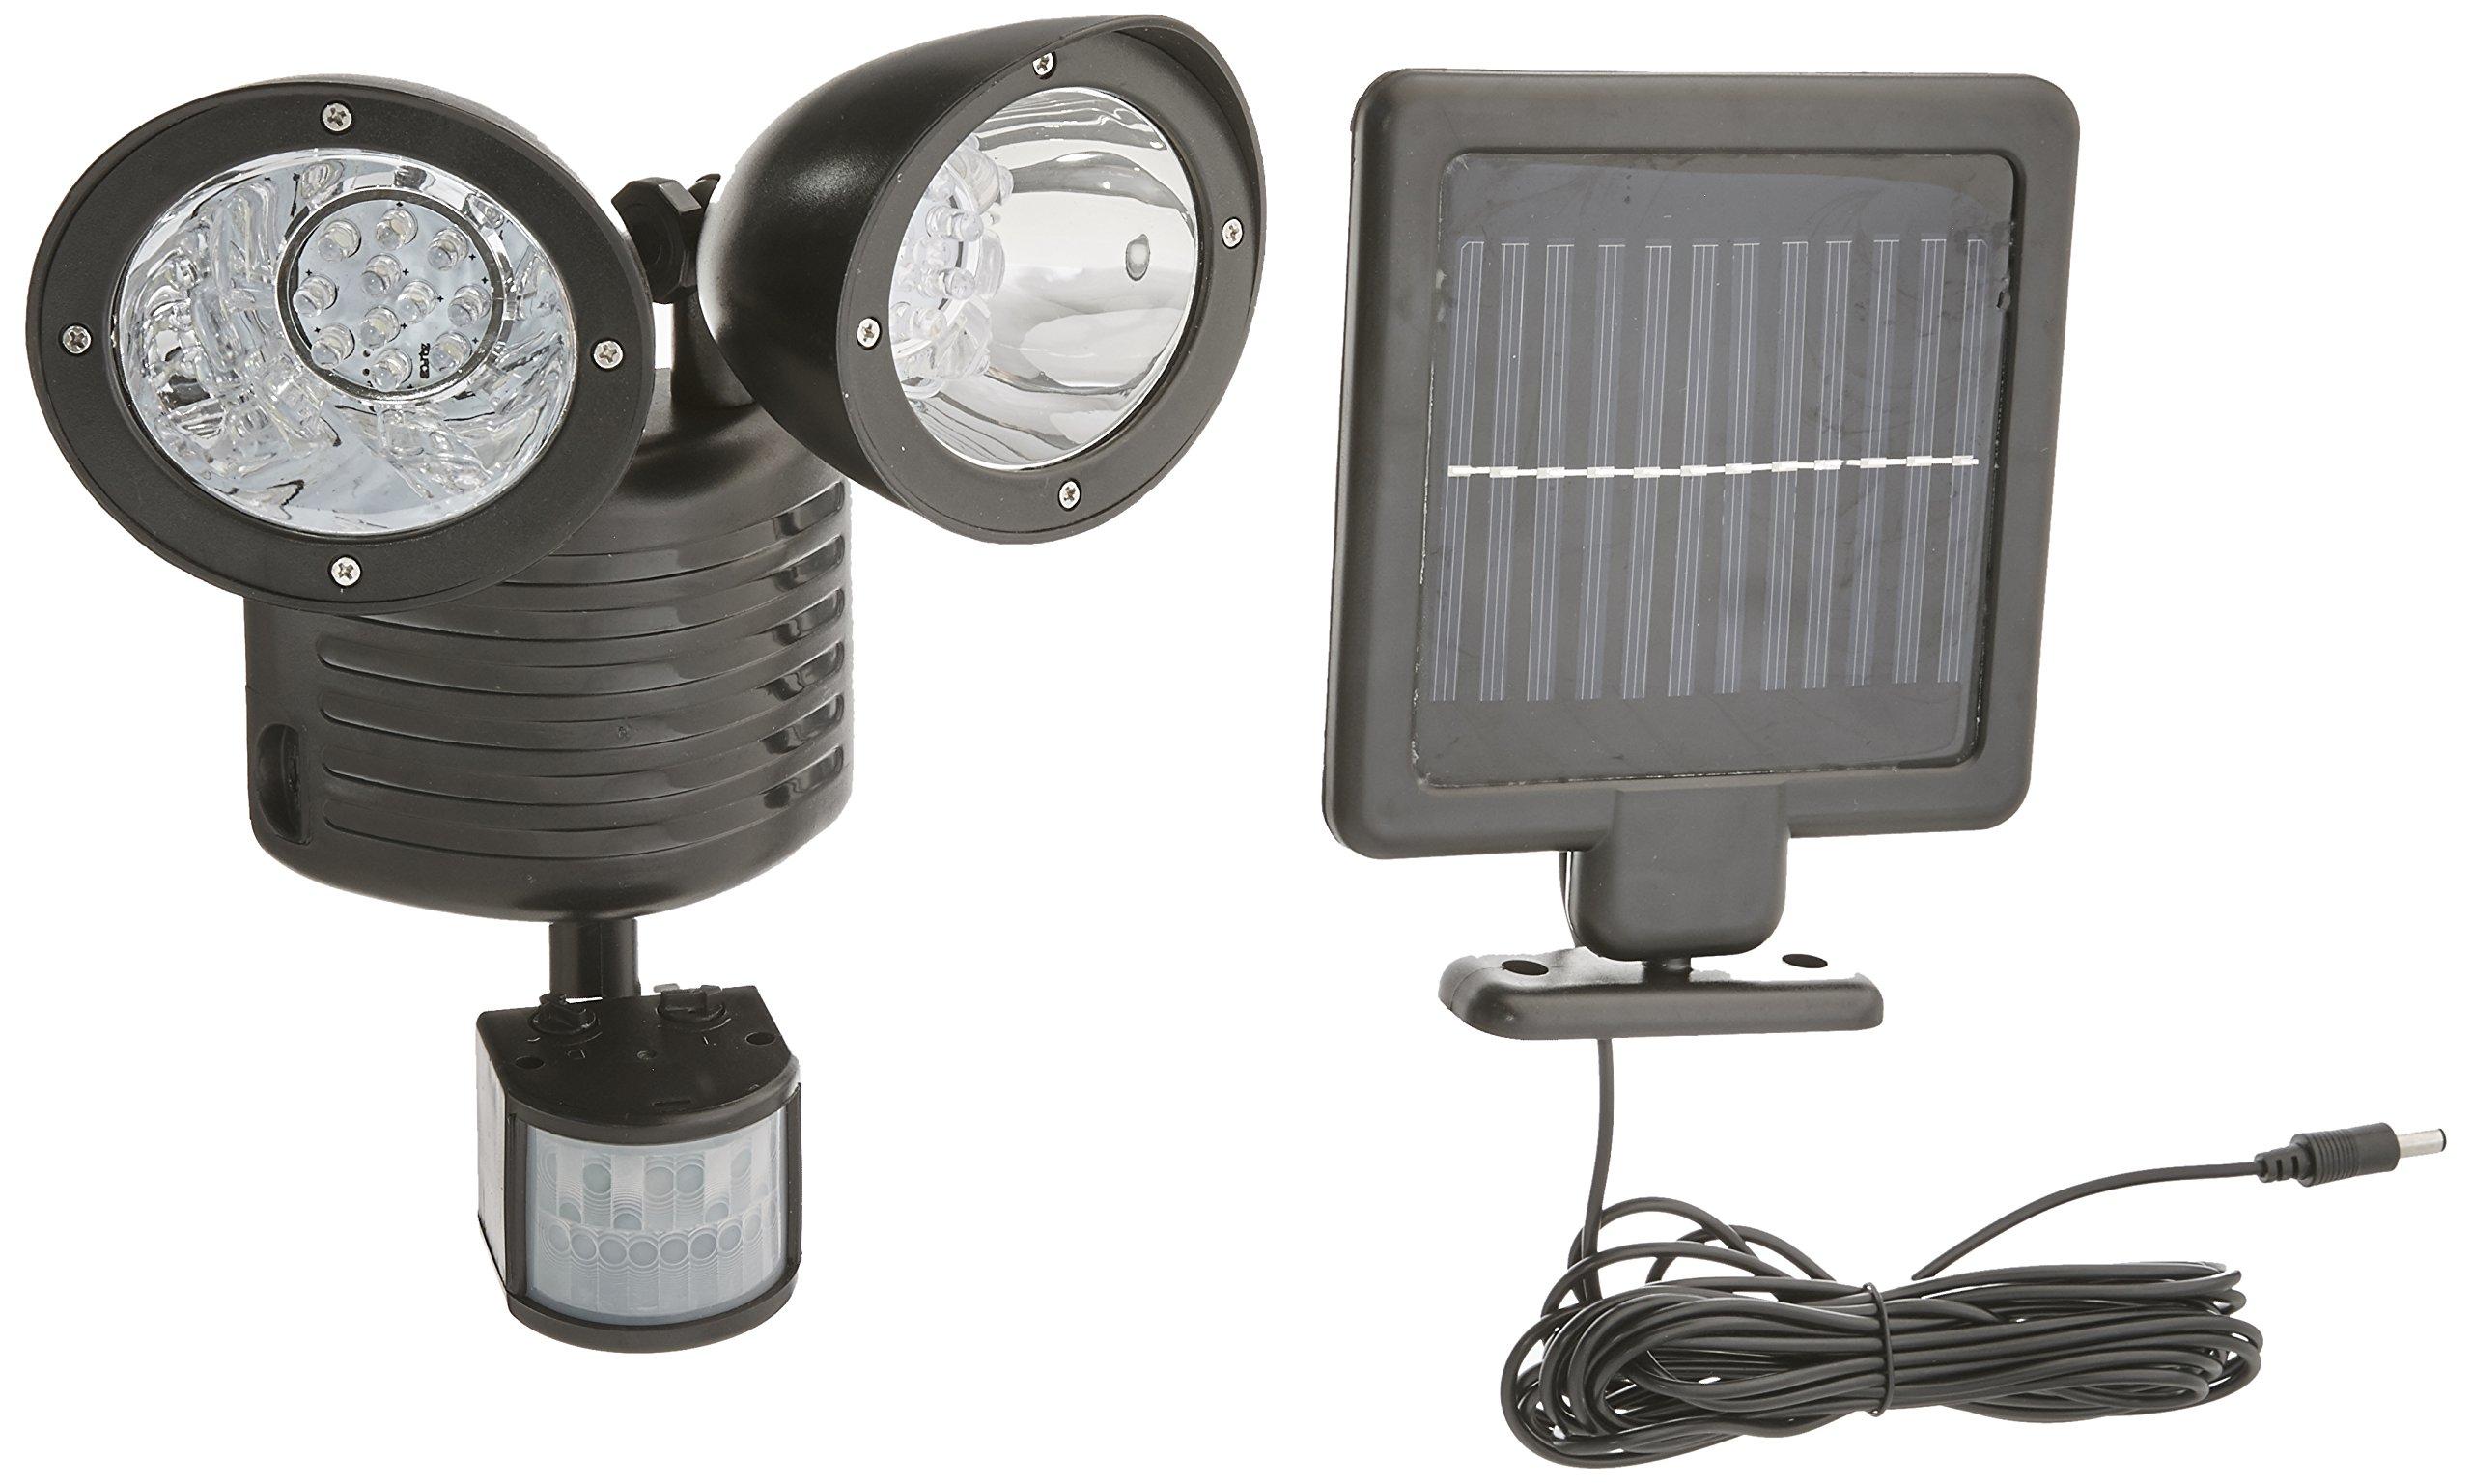 GSL SS E2167B Solar Flood Motion Sensor Security Light